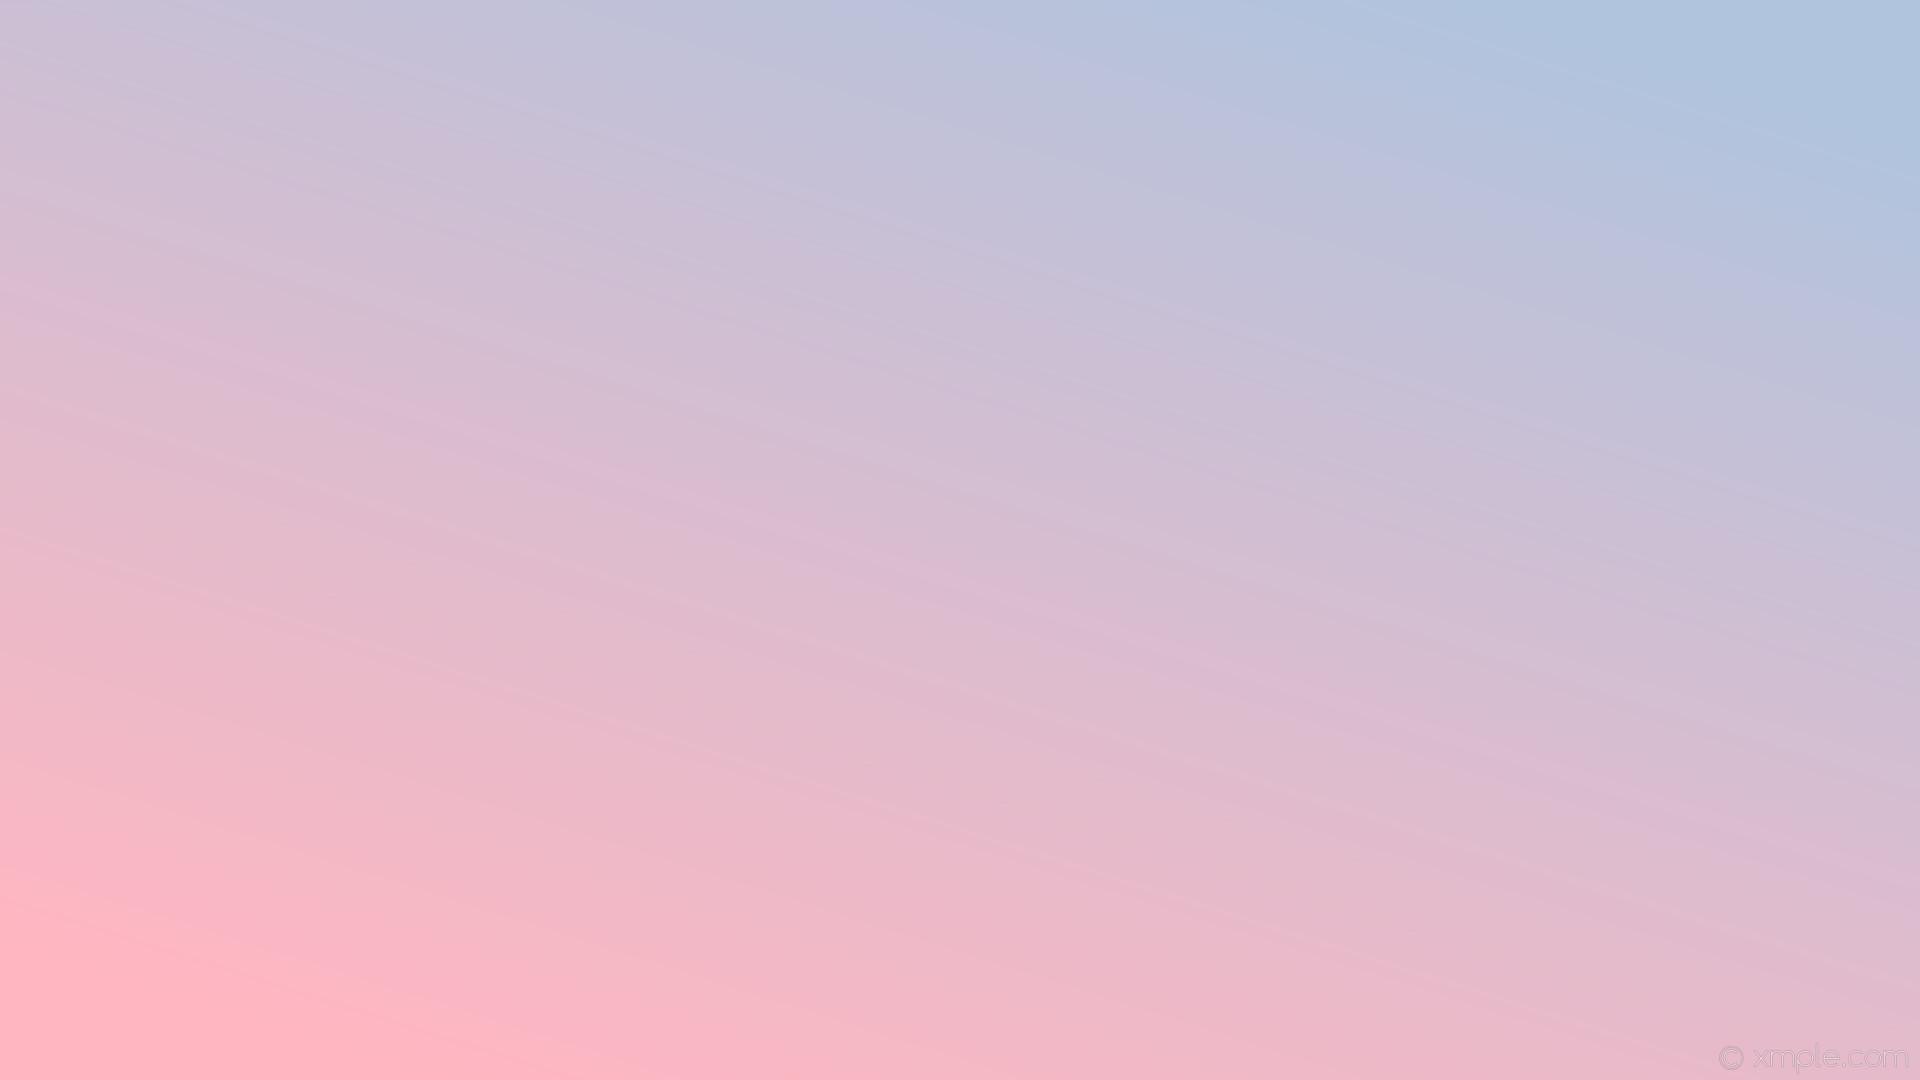 wallpaper blue pink gradient linear light pink light steel blue #ffb6c1  #b0c4de 225°